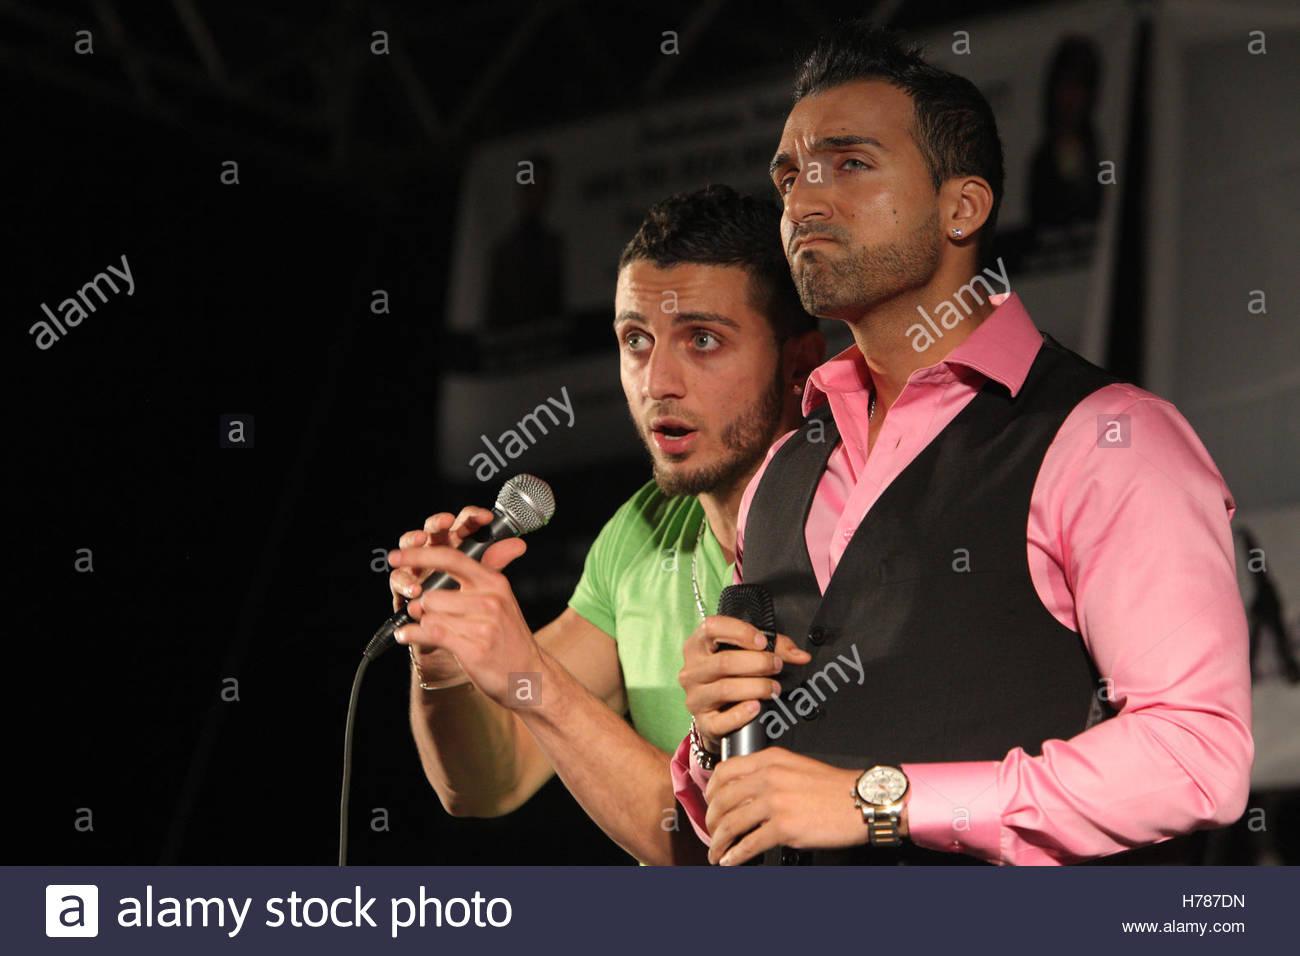 Pakistani Canadian Singers And Rappers Sham Idrees And Karter Zaheri Stock Photo Alamy